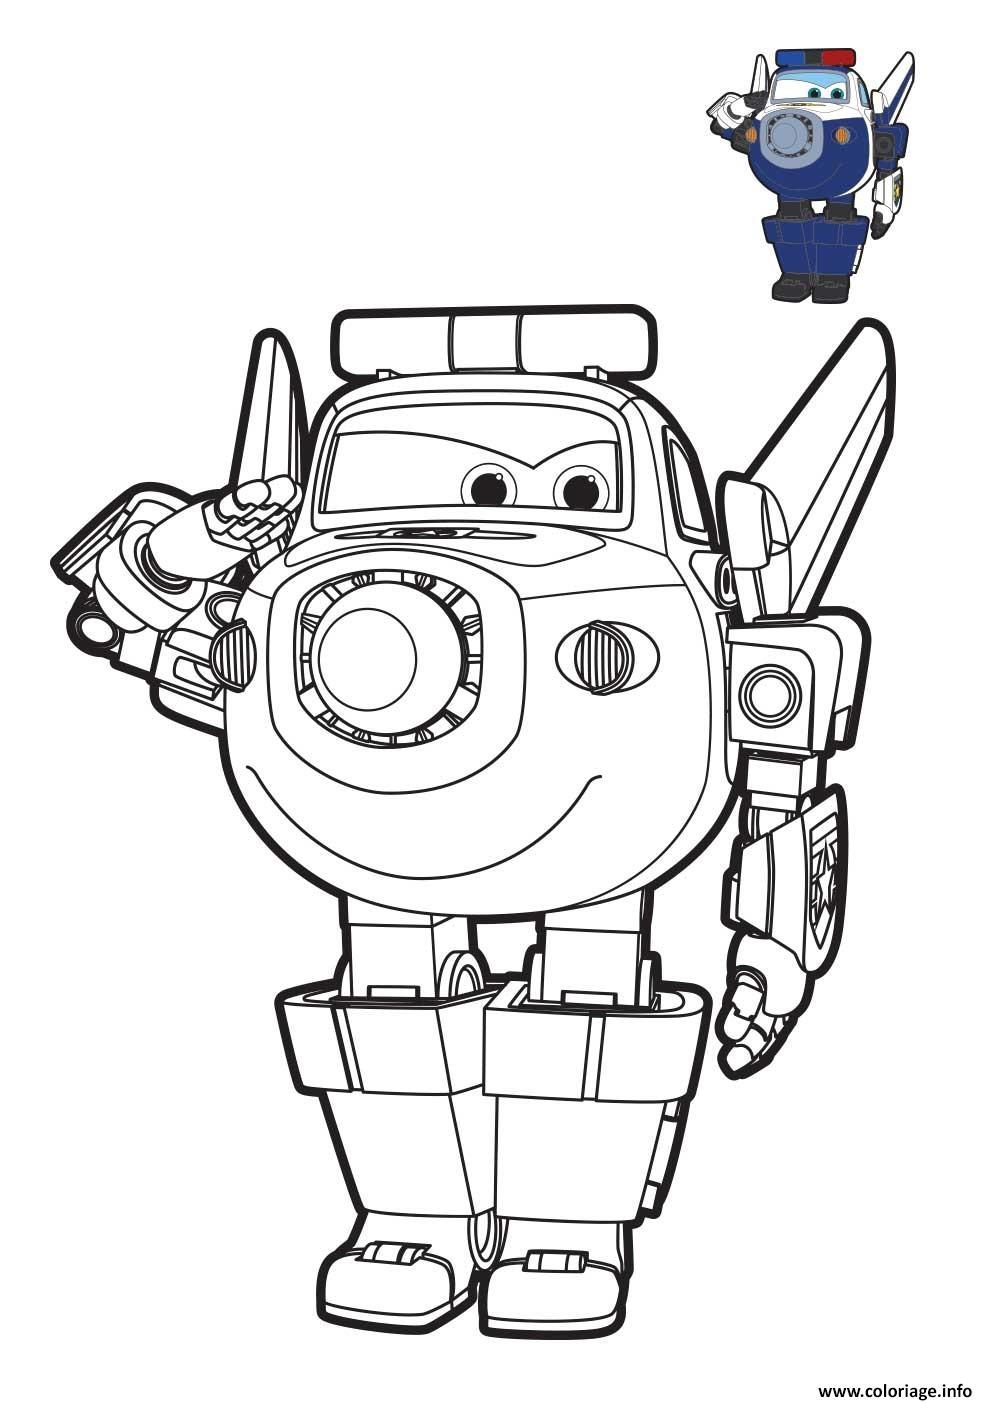 Coloriage Super Wings Paul Robot Dessin